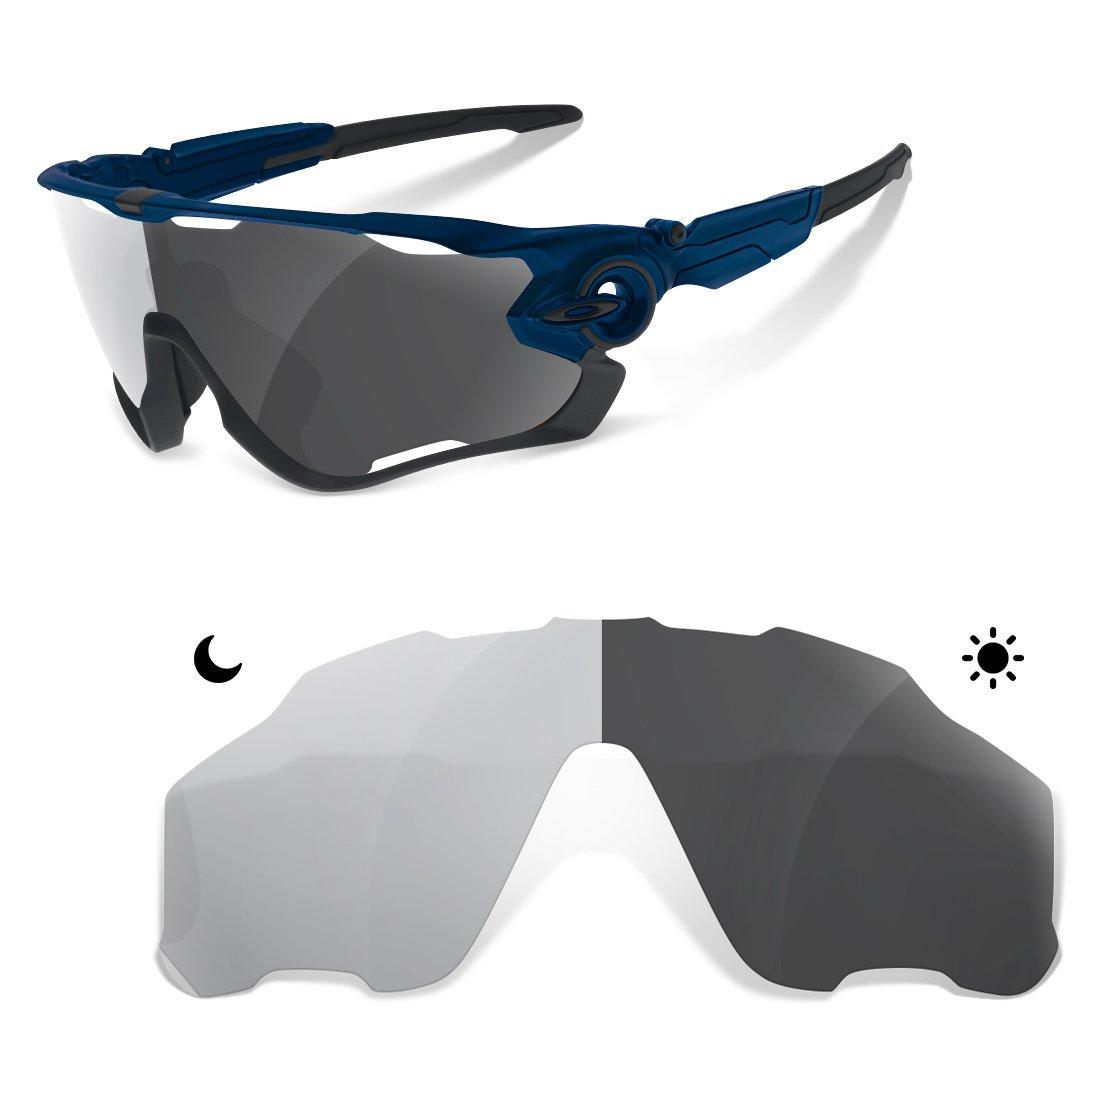 31507b8f45 Polarized Photochromic Grey Replacement Lenses for Oakley Jawbreaker (15% -  35%)  Amazon.ca  Sports   Outdoors